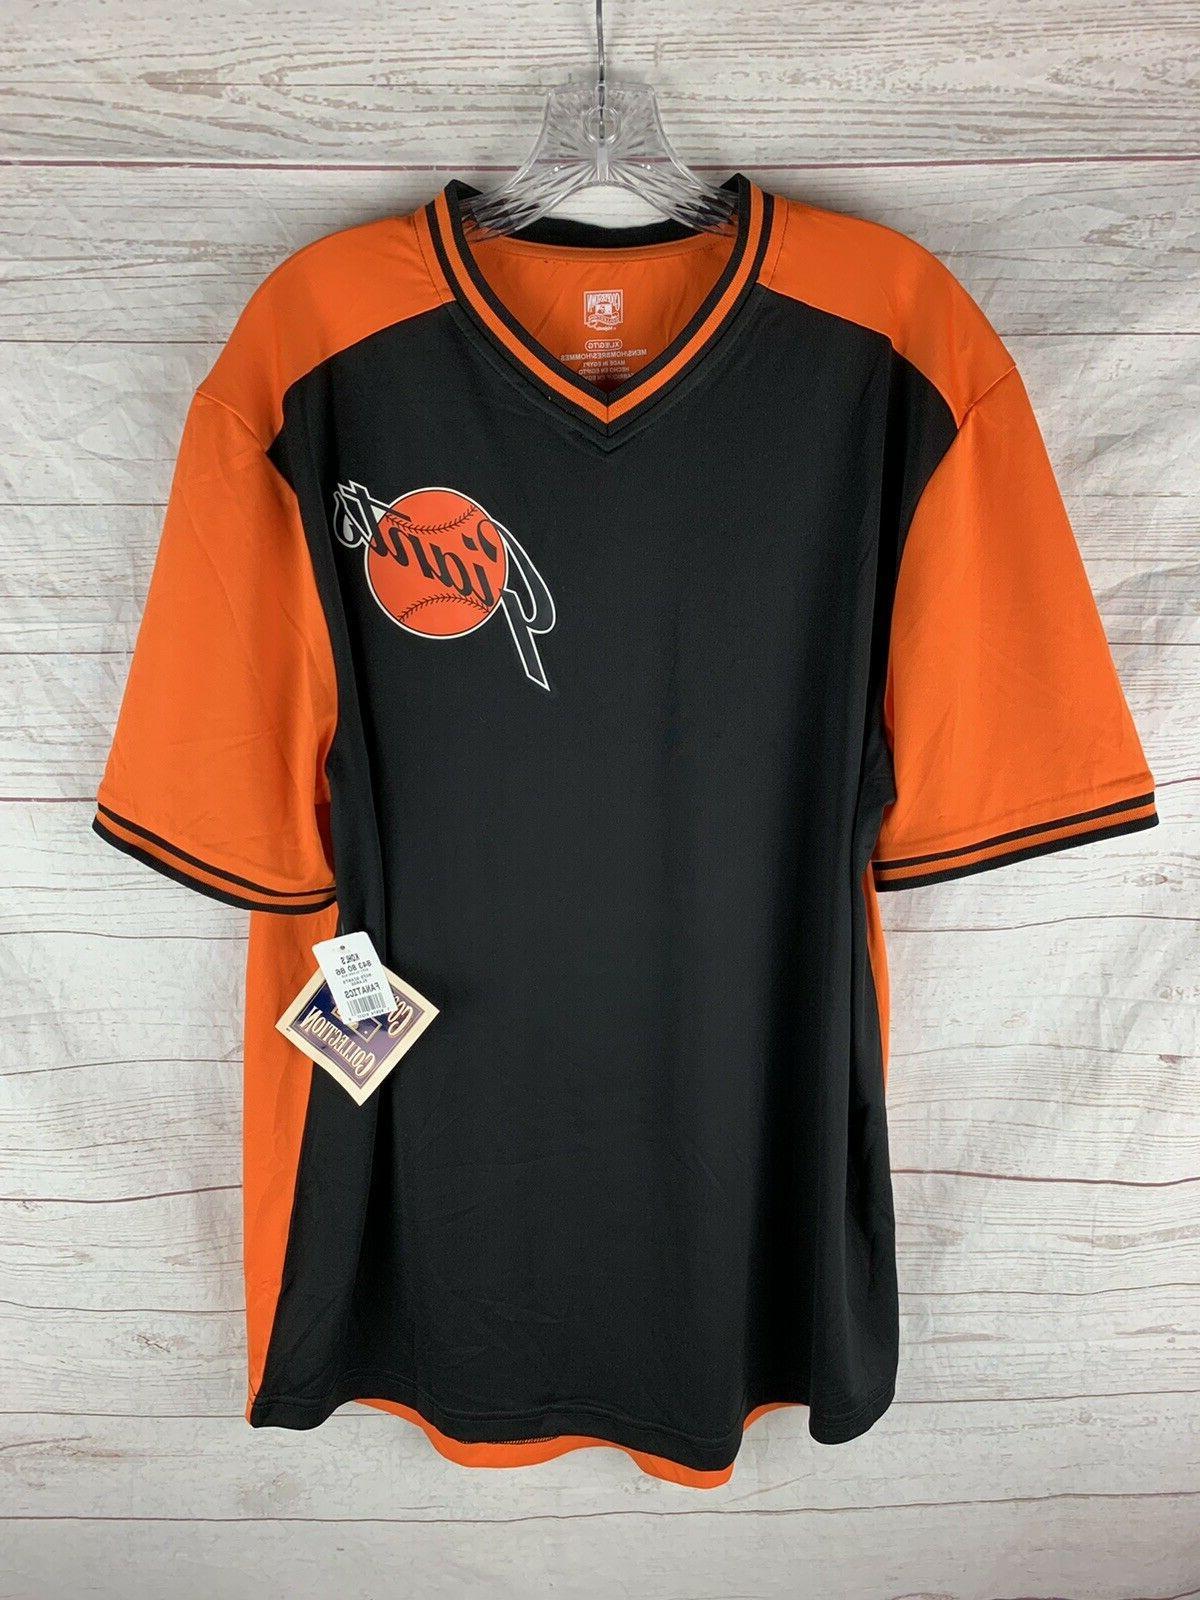 new san francisco giants jersey shirt size